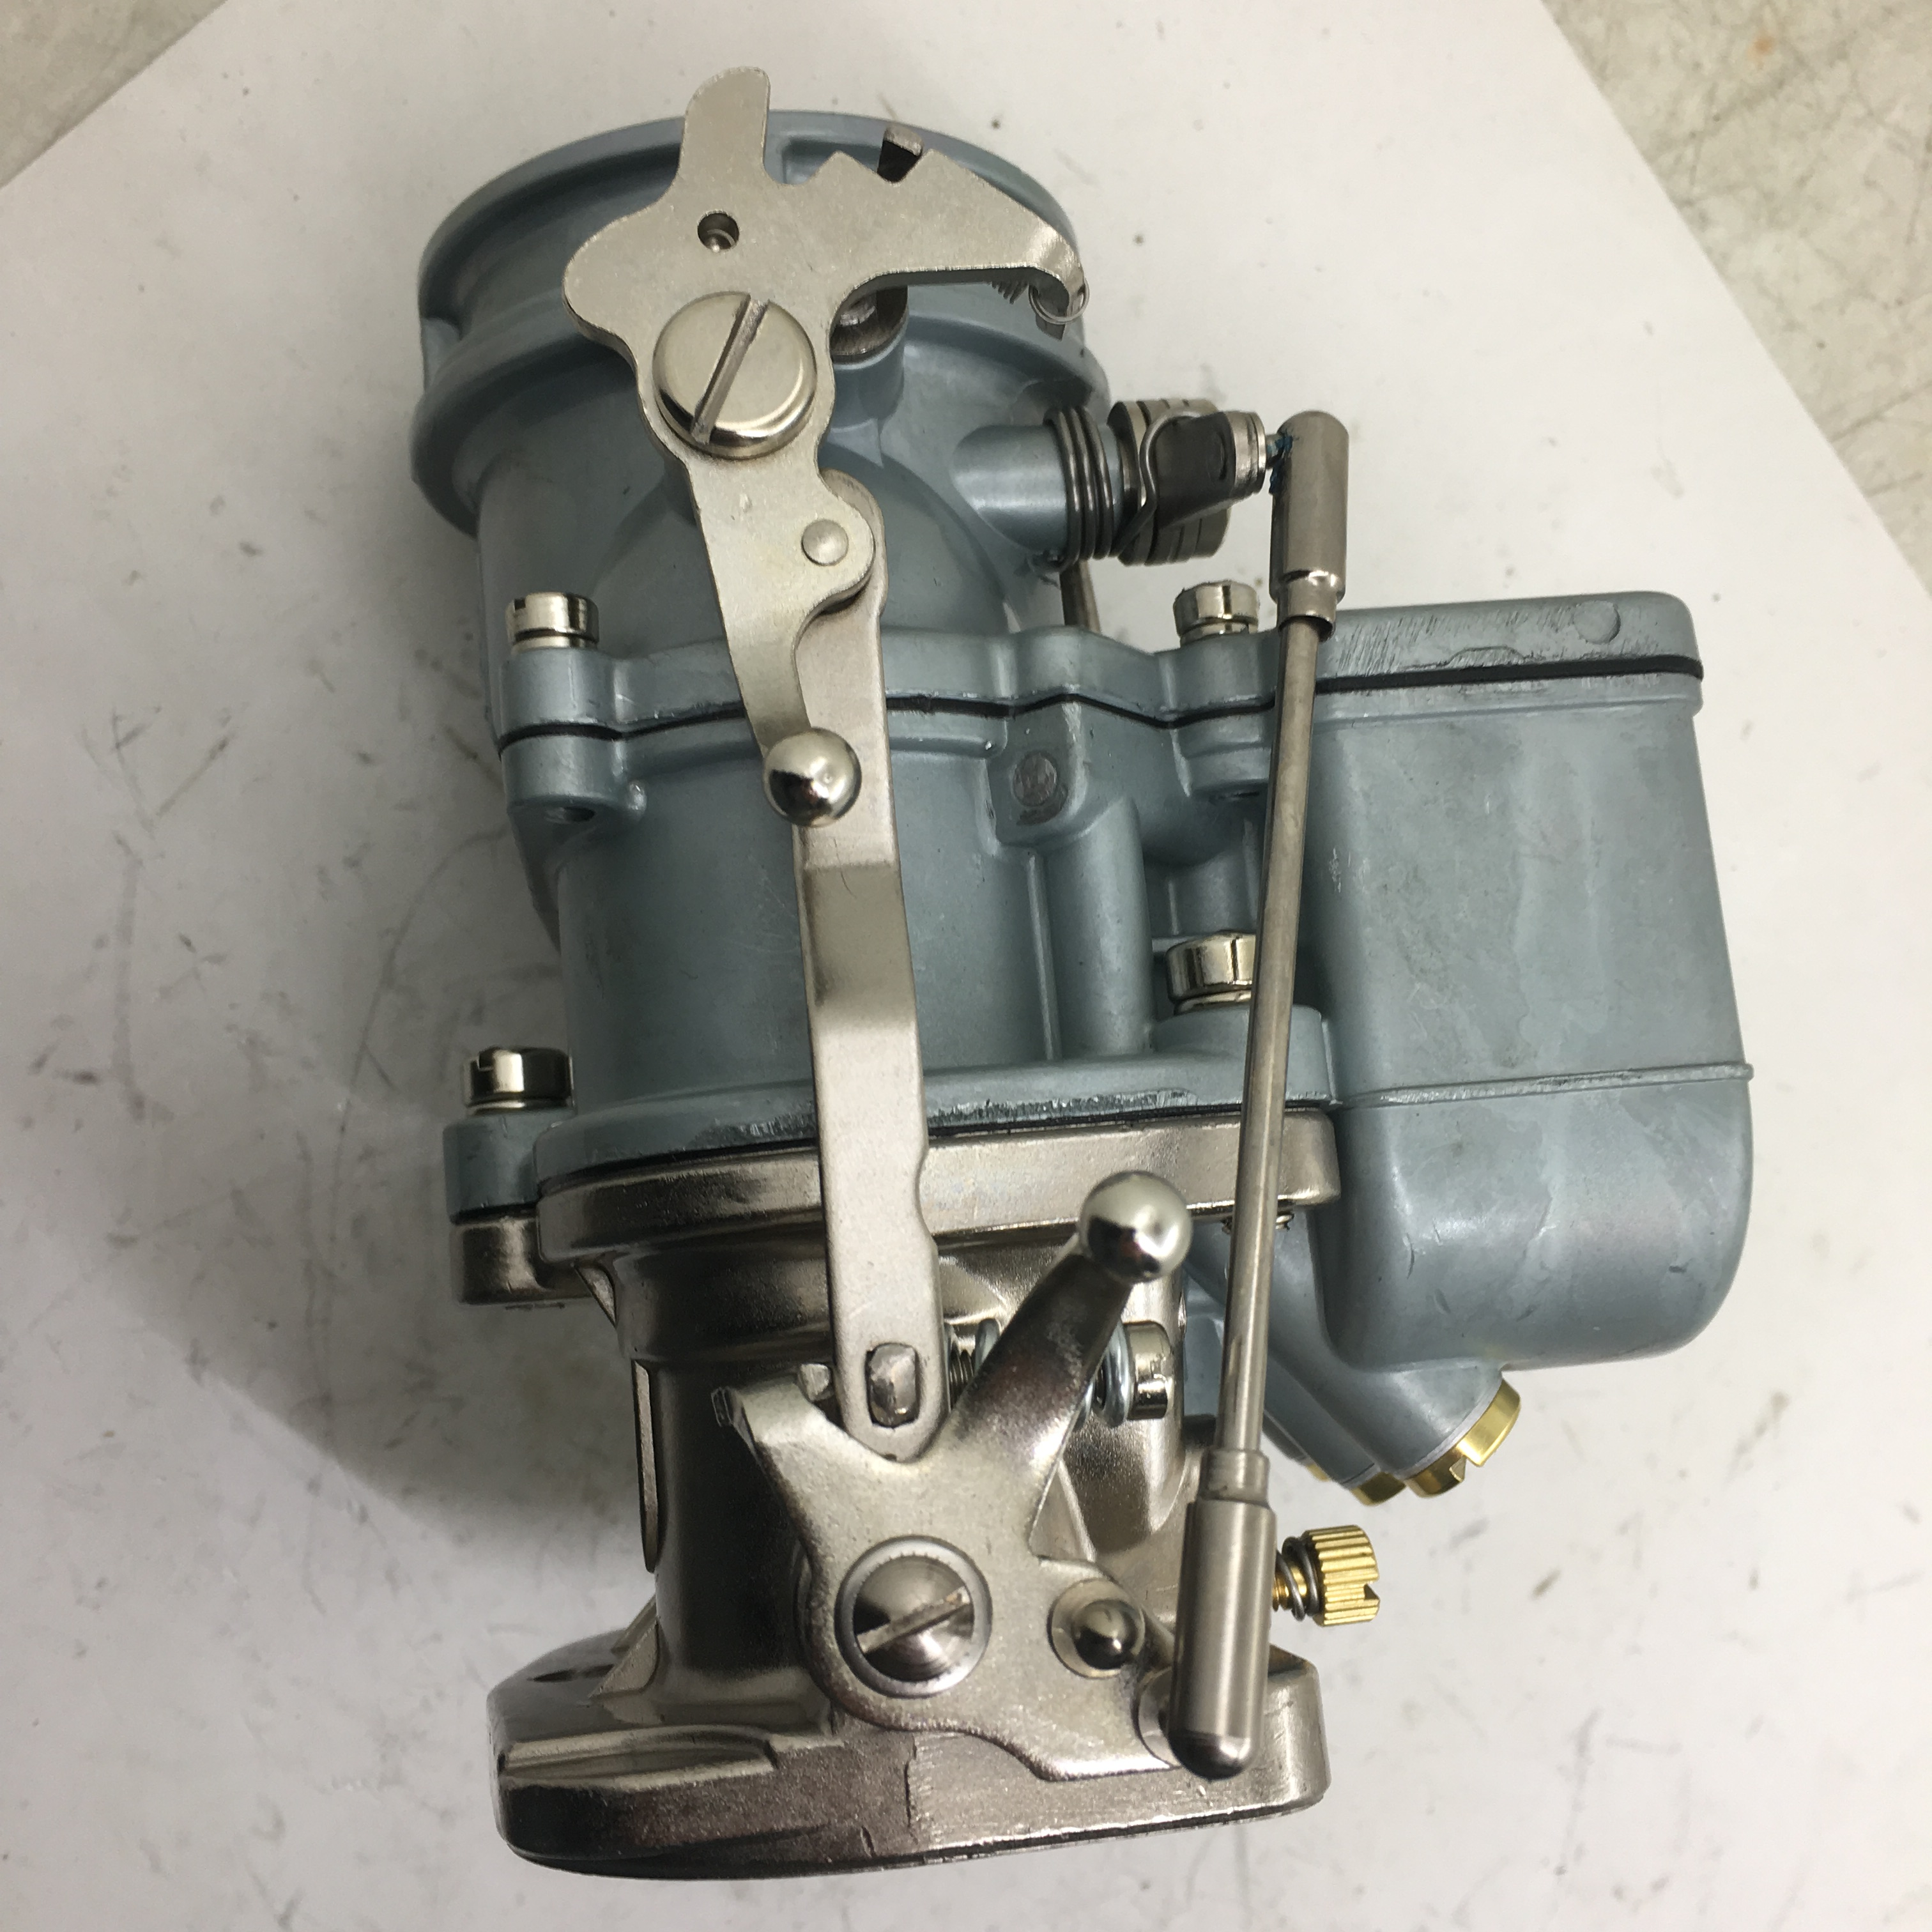 SherryBerg الساخن قضيب OEM المكربن لفورد فلاتيد Carb carburettor سوبر 97 الانتهاء الطبيعي 2-Bbl 97 استبدال سترومبرغ